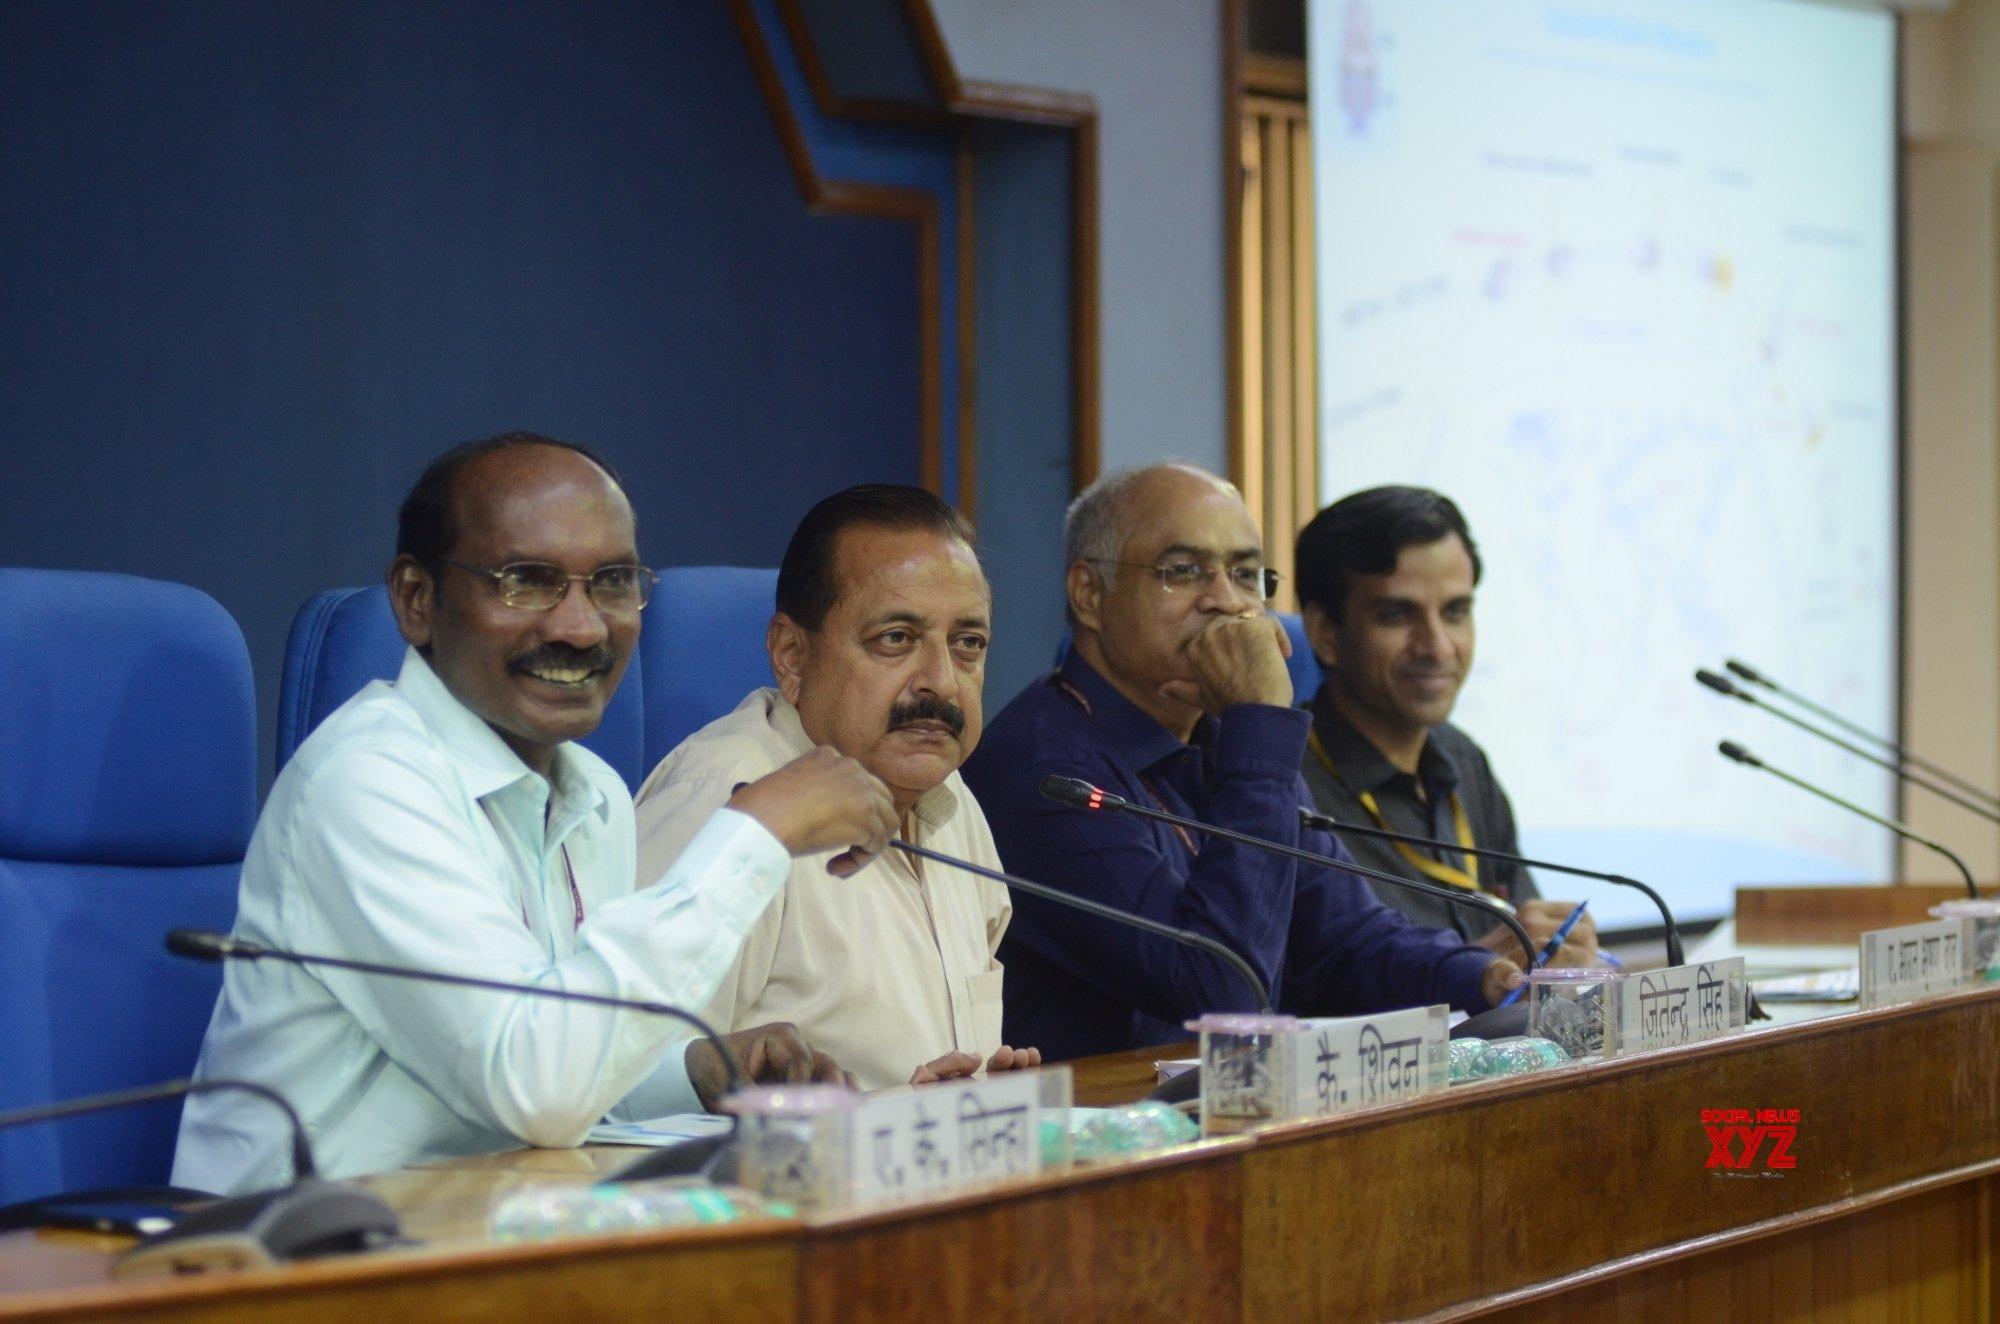 New Delhi: K. Sivan, Jitendra Singh's press conference (Batch - 2) #Gallery